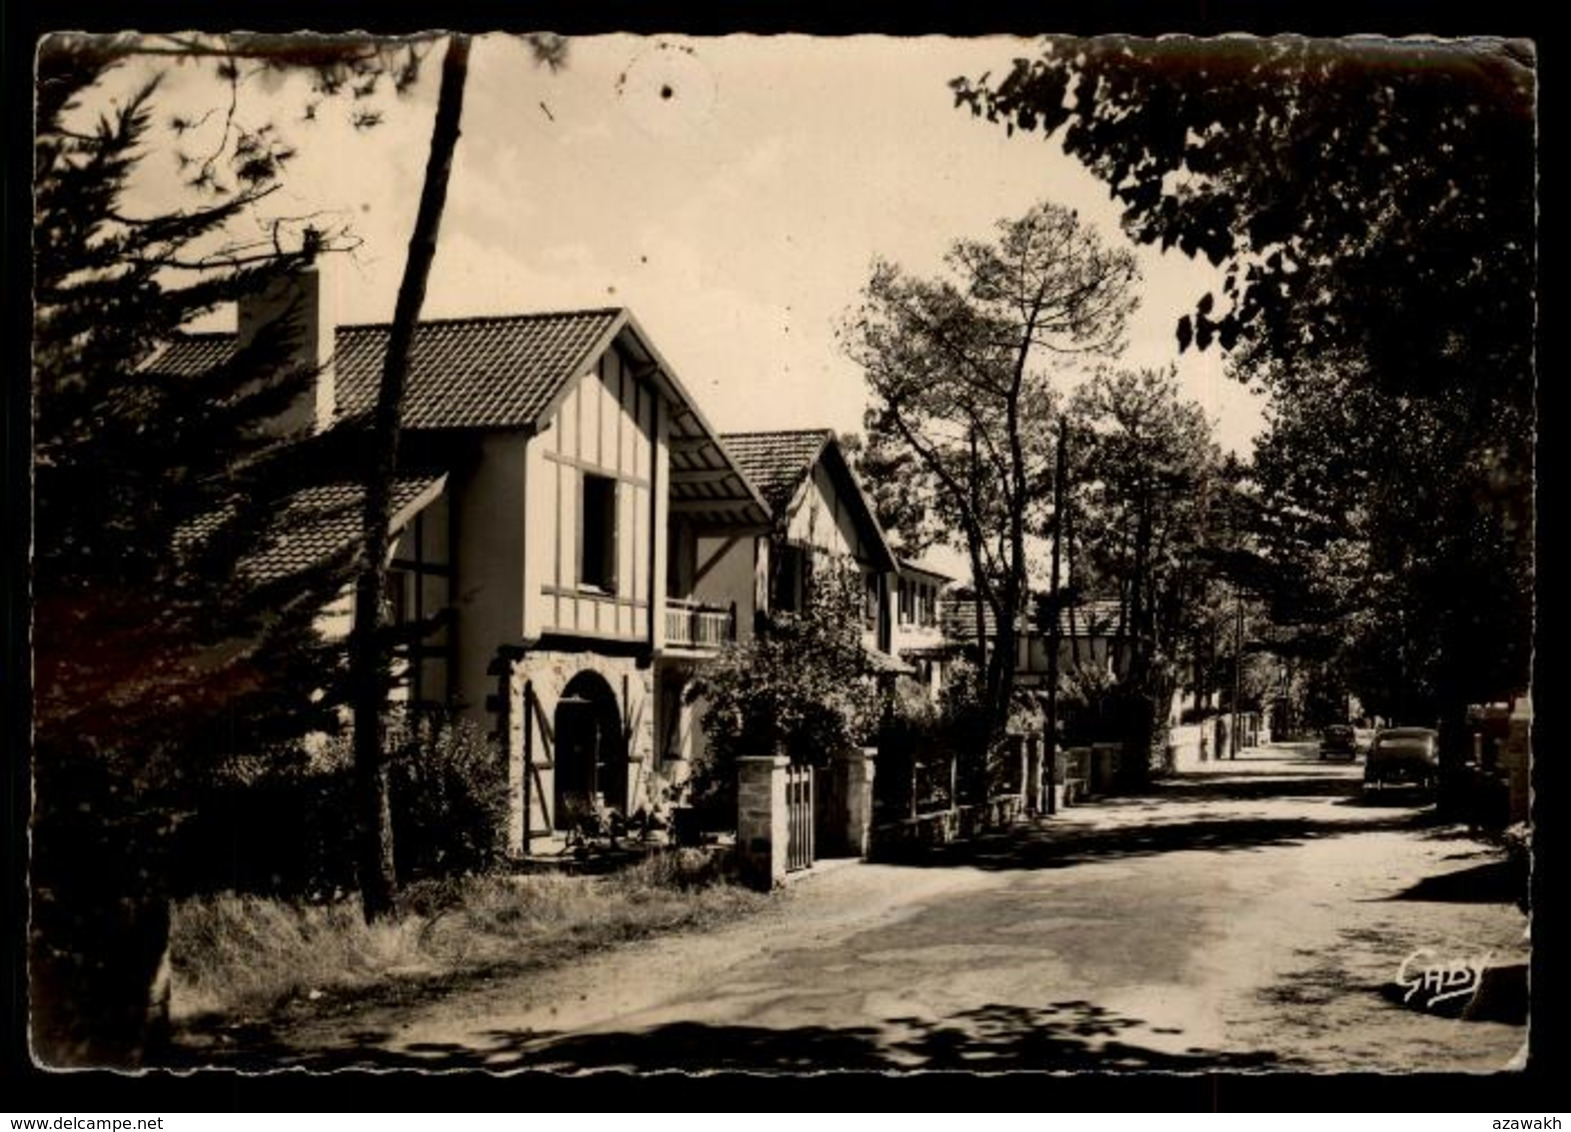 56 - Carnac - Quiberon 57 - (Morbihan) Avenue De Kermaria #03062 - Carnac